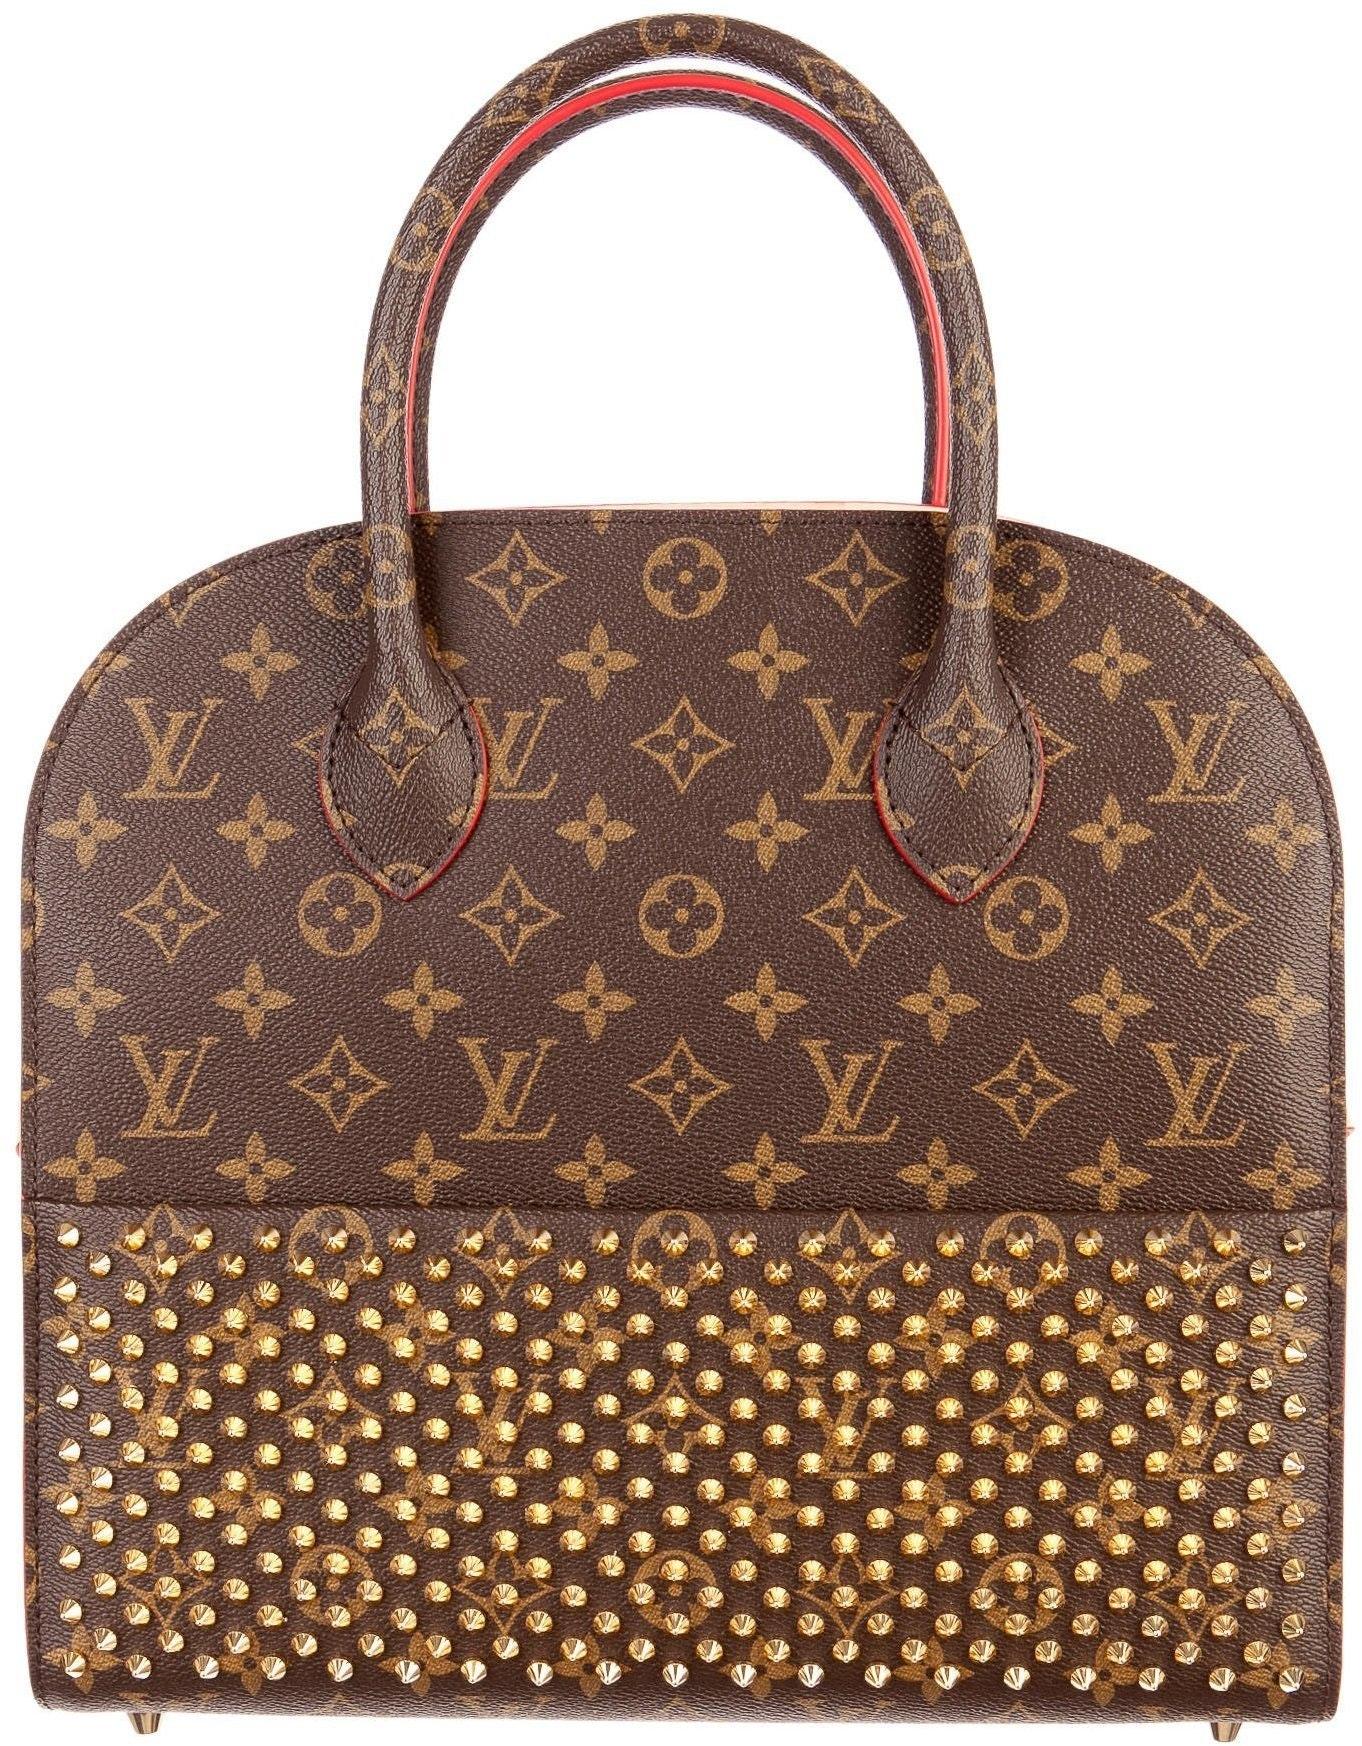 Louis Vuitton Shopping Bag Christian Louboutin Monogram Brown/Red